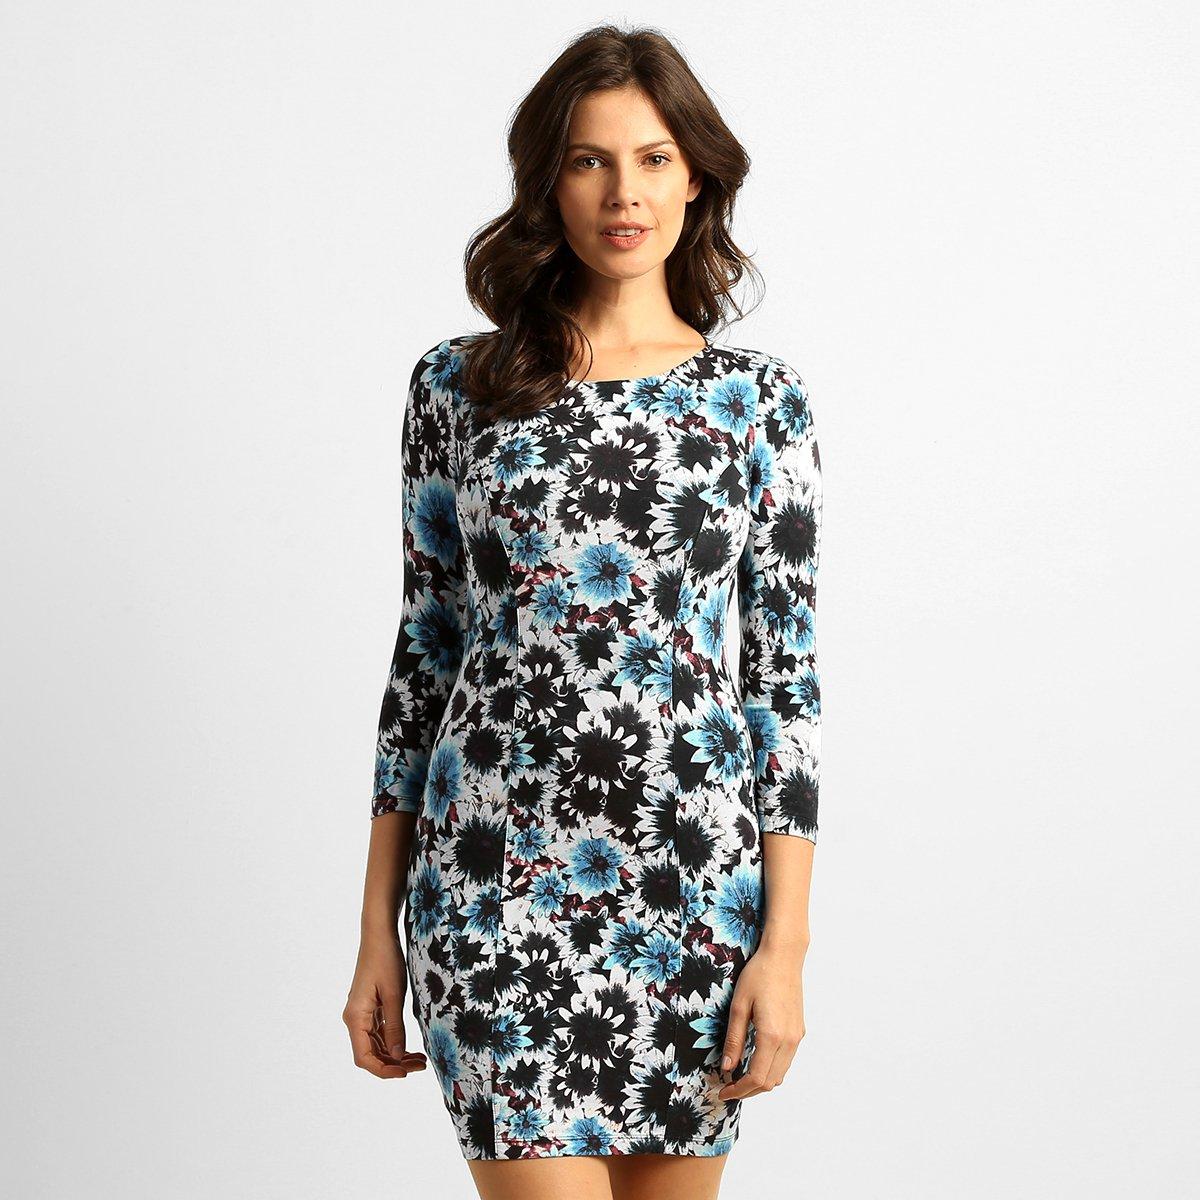 Vestido floral azul e branco